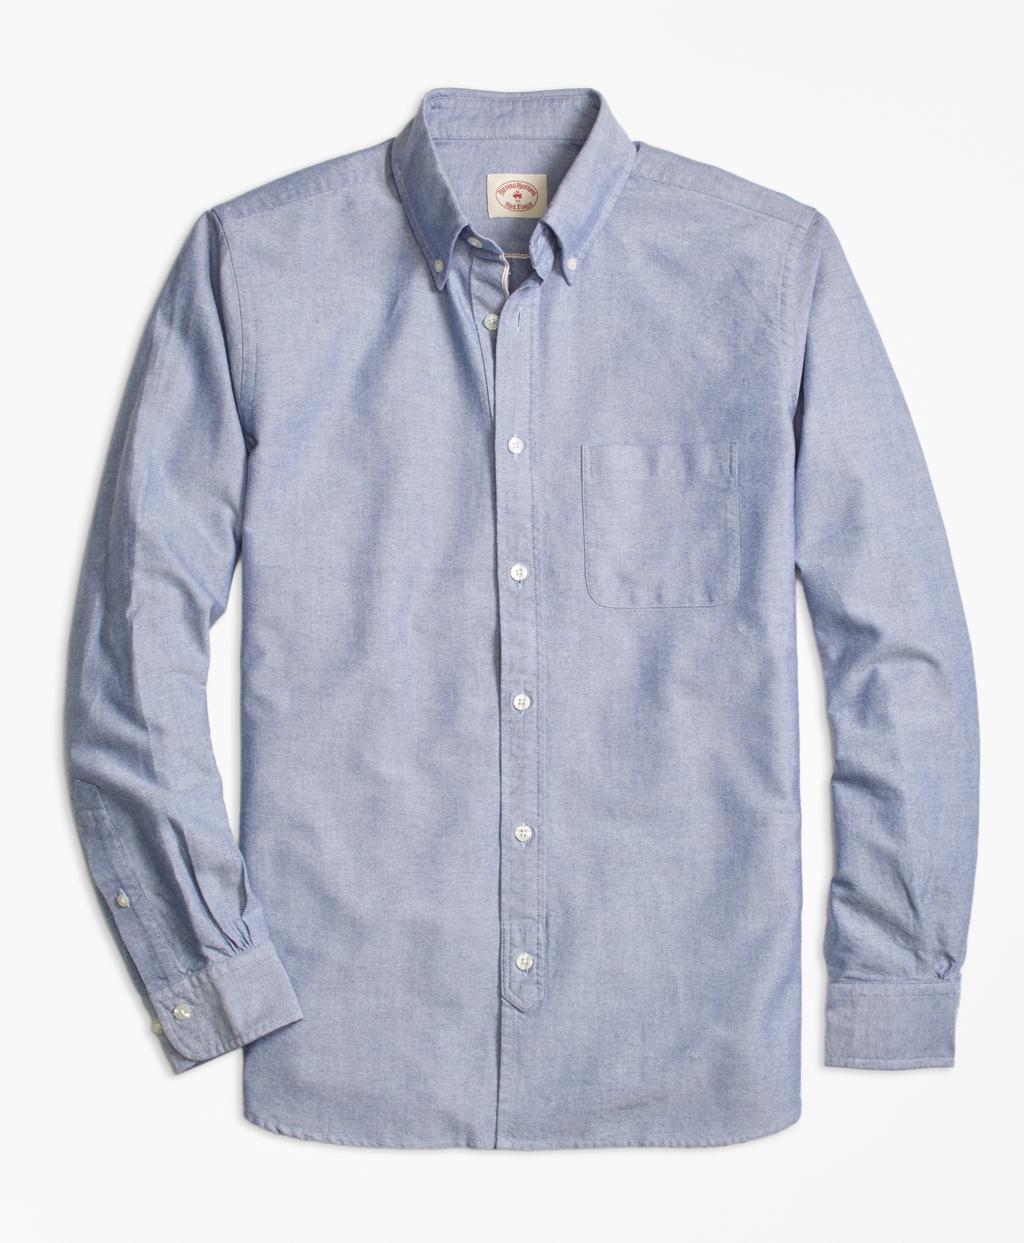 Lyst brooks brothers selvedge oxford sport shirt in blue for Brooks brothers sports shirts